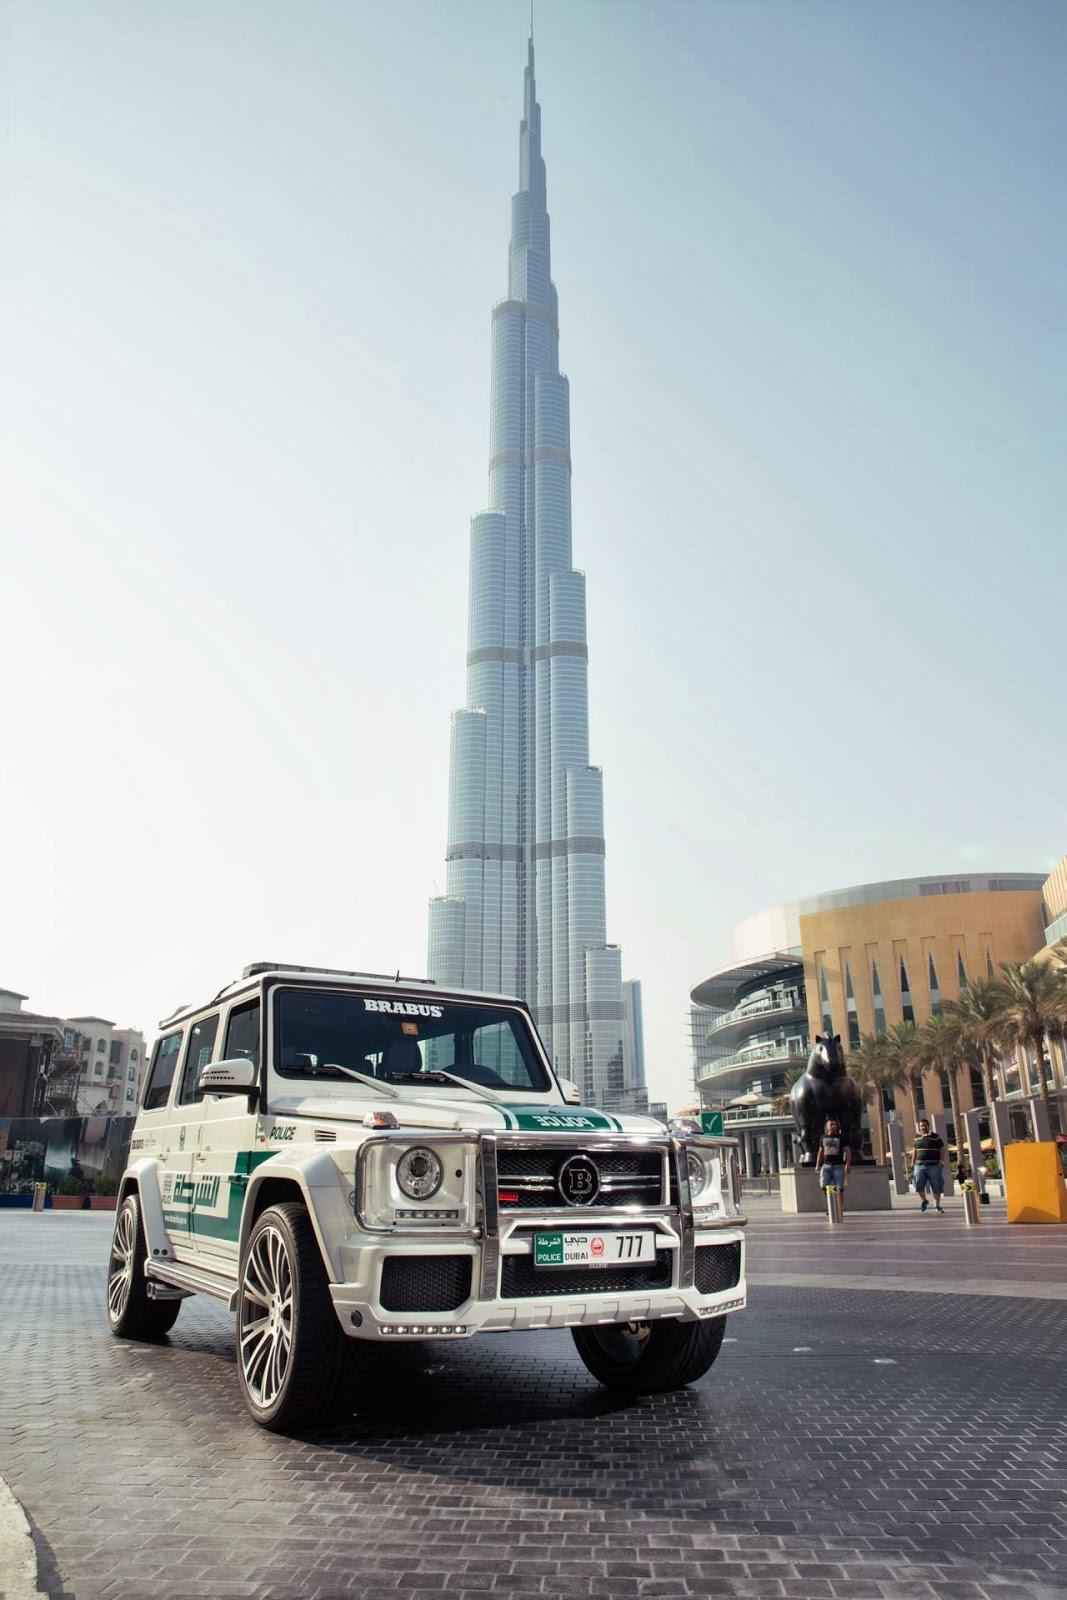 New SUV for Dubai Police | Brabus Mercedes G63 AMG - cars & life | cars fashion lifestyle blog